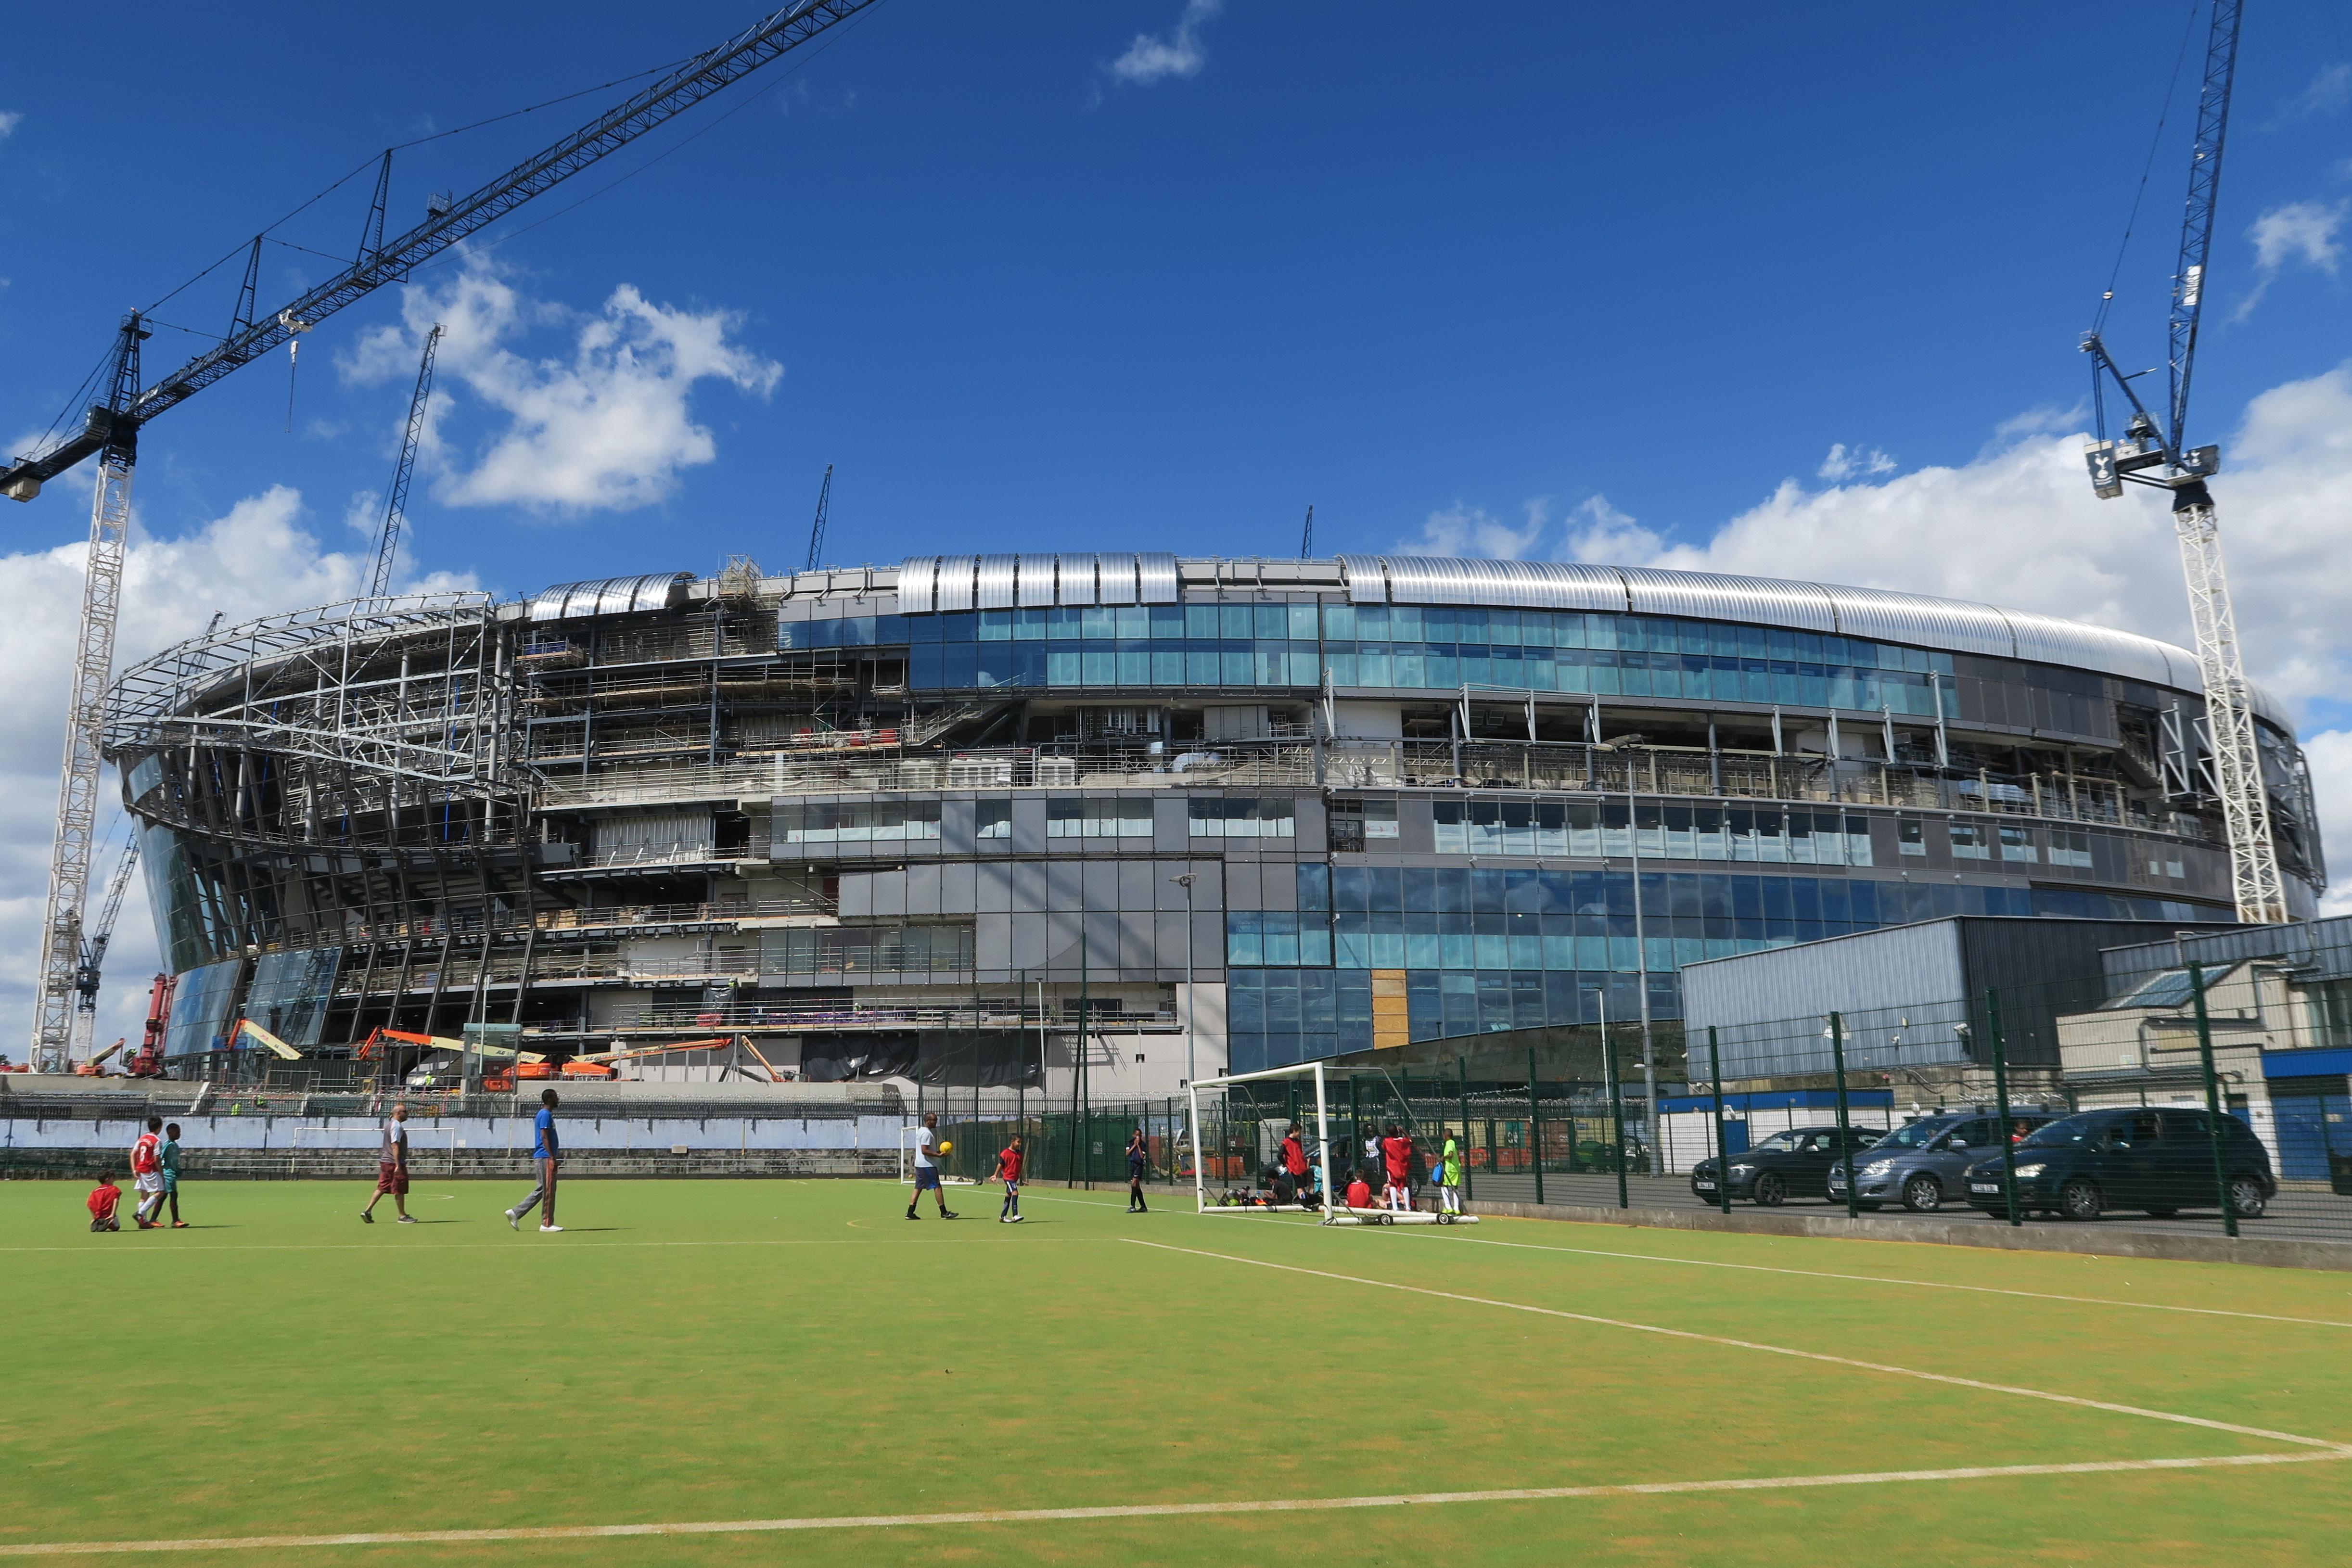 tottenham hotspur stadium - wikipedia